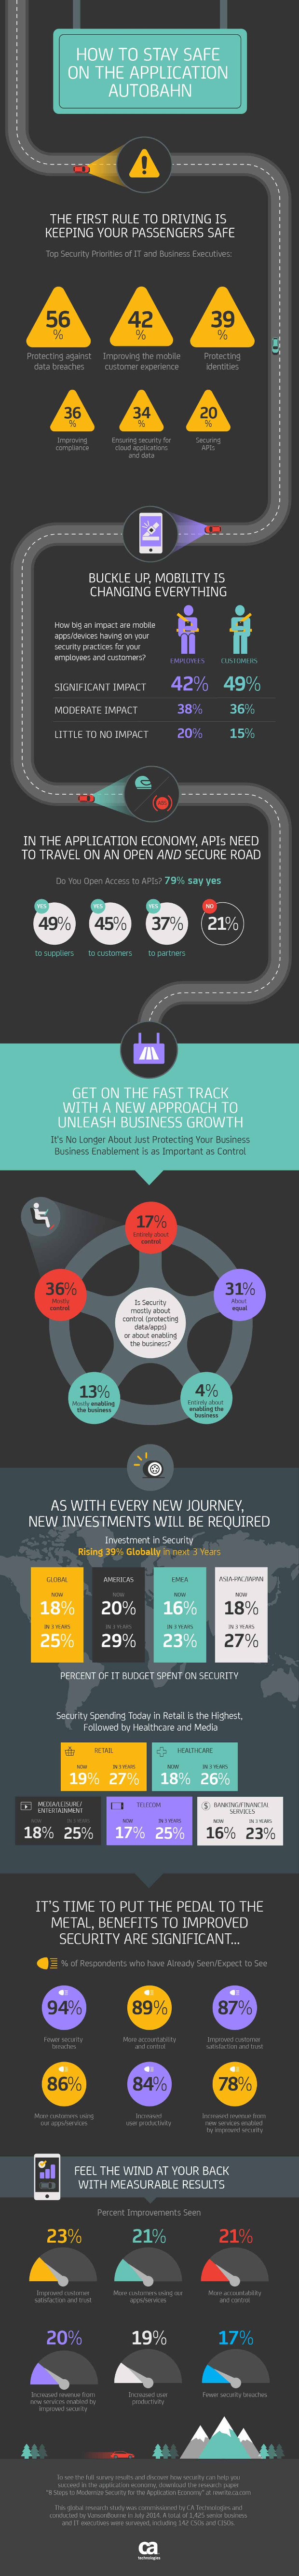 Infografia, economia aplicaciones